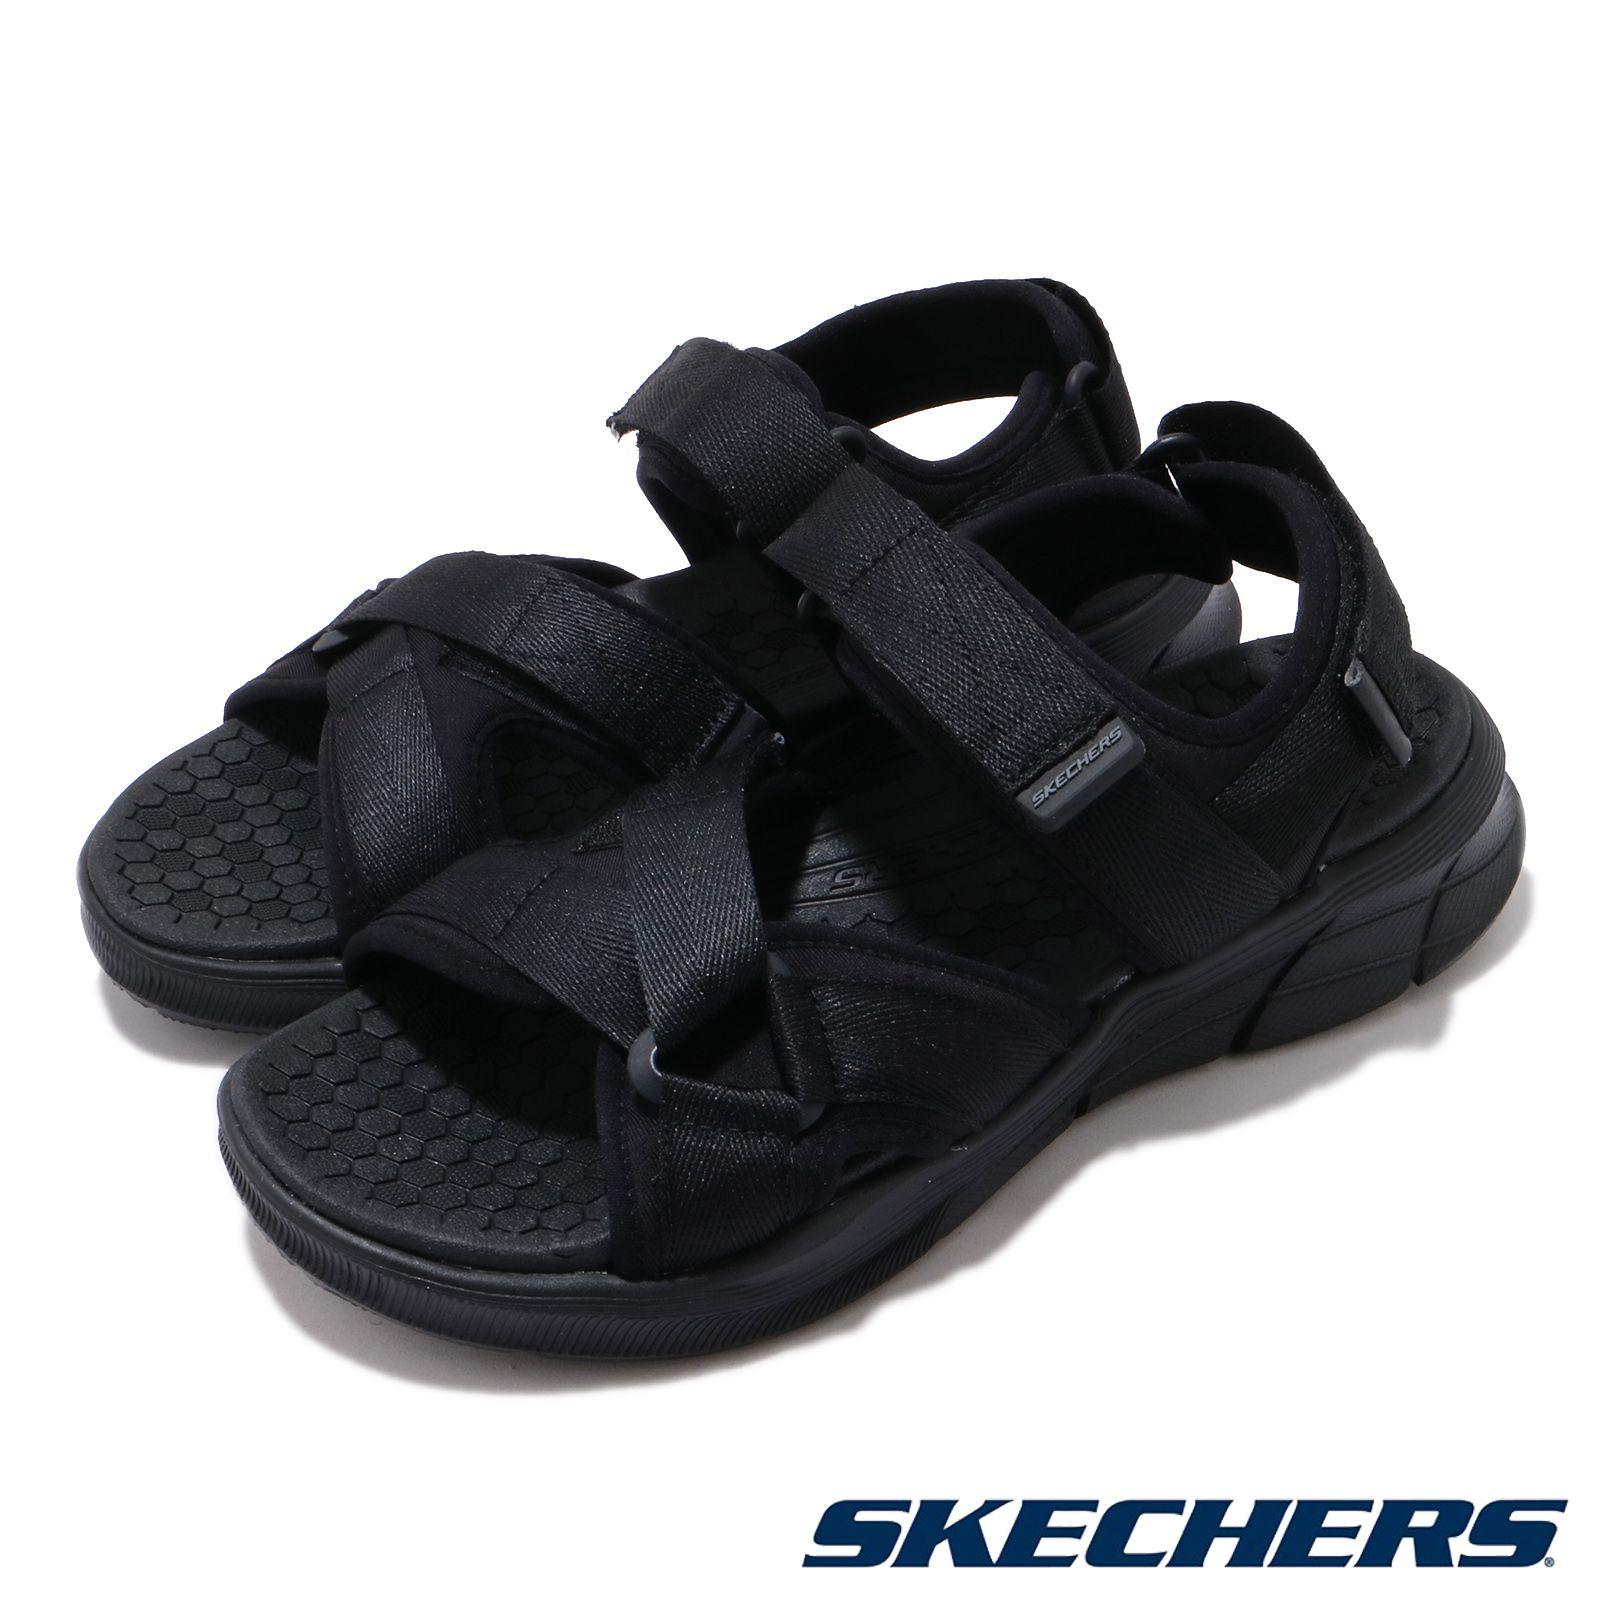 Skechers 涼拖鞋 Equalizer 4 Sandal 男鞋 運動休閒 踏青 魔鬼氈 可調 夏日必備 黑 237050BBK 237050BBK